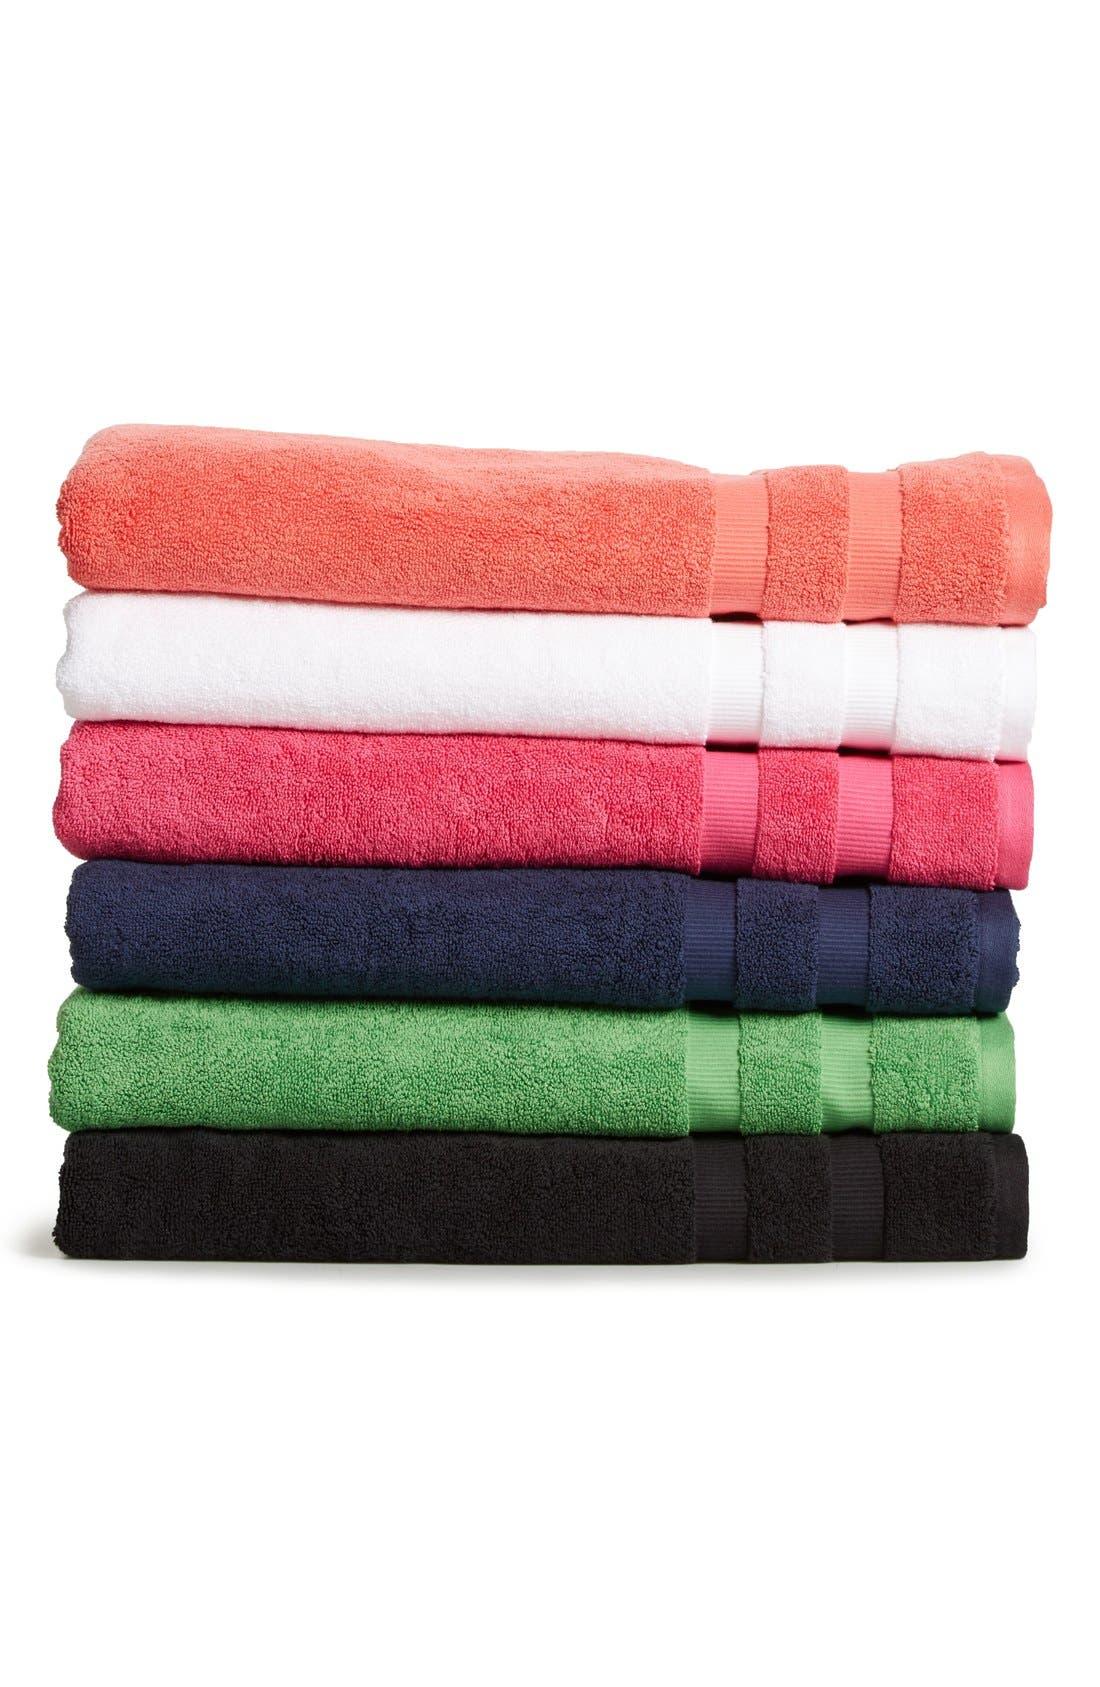 'chattam' stripe bath sheet,                             Alternate thumbnail 2, color,